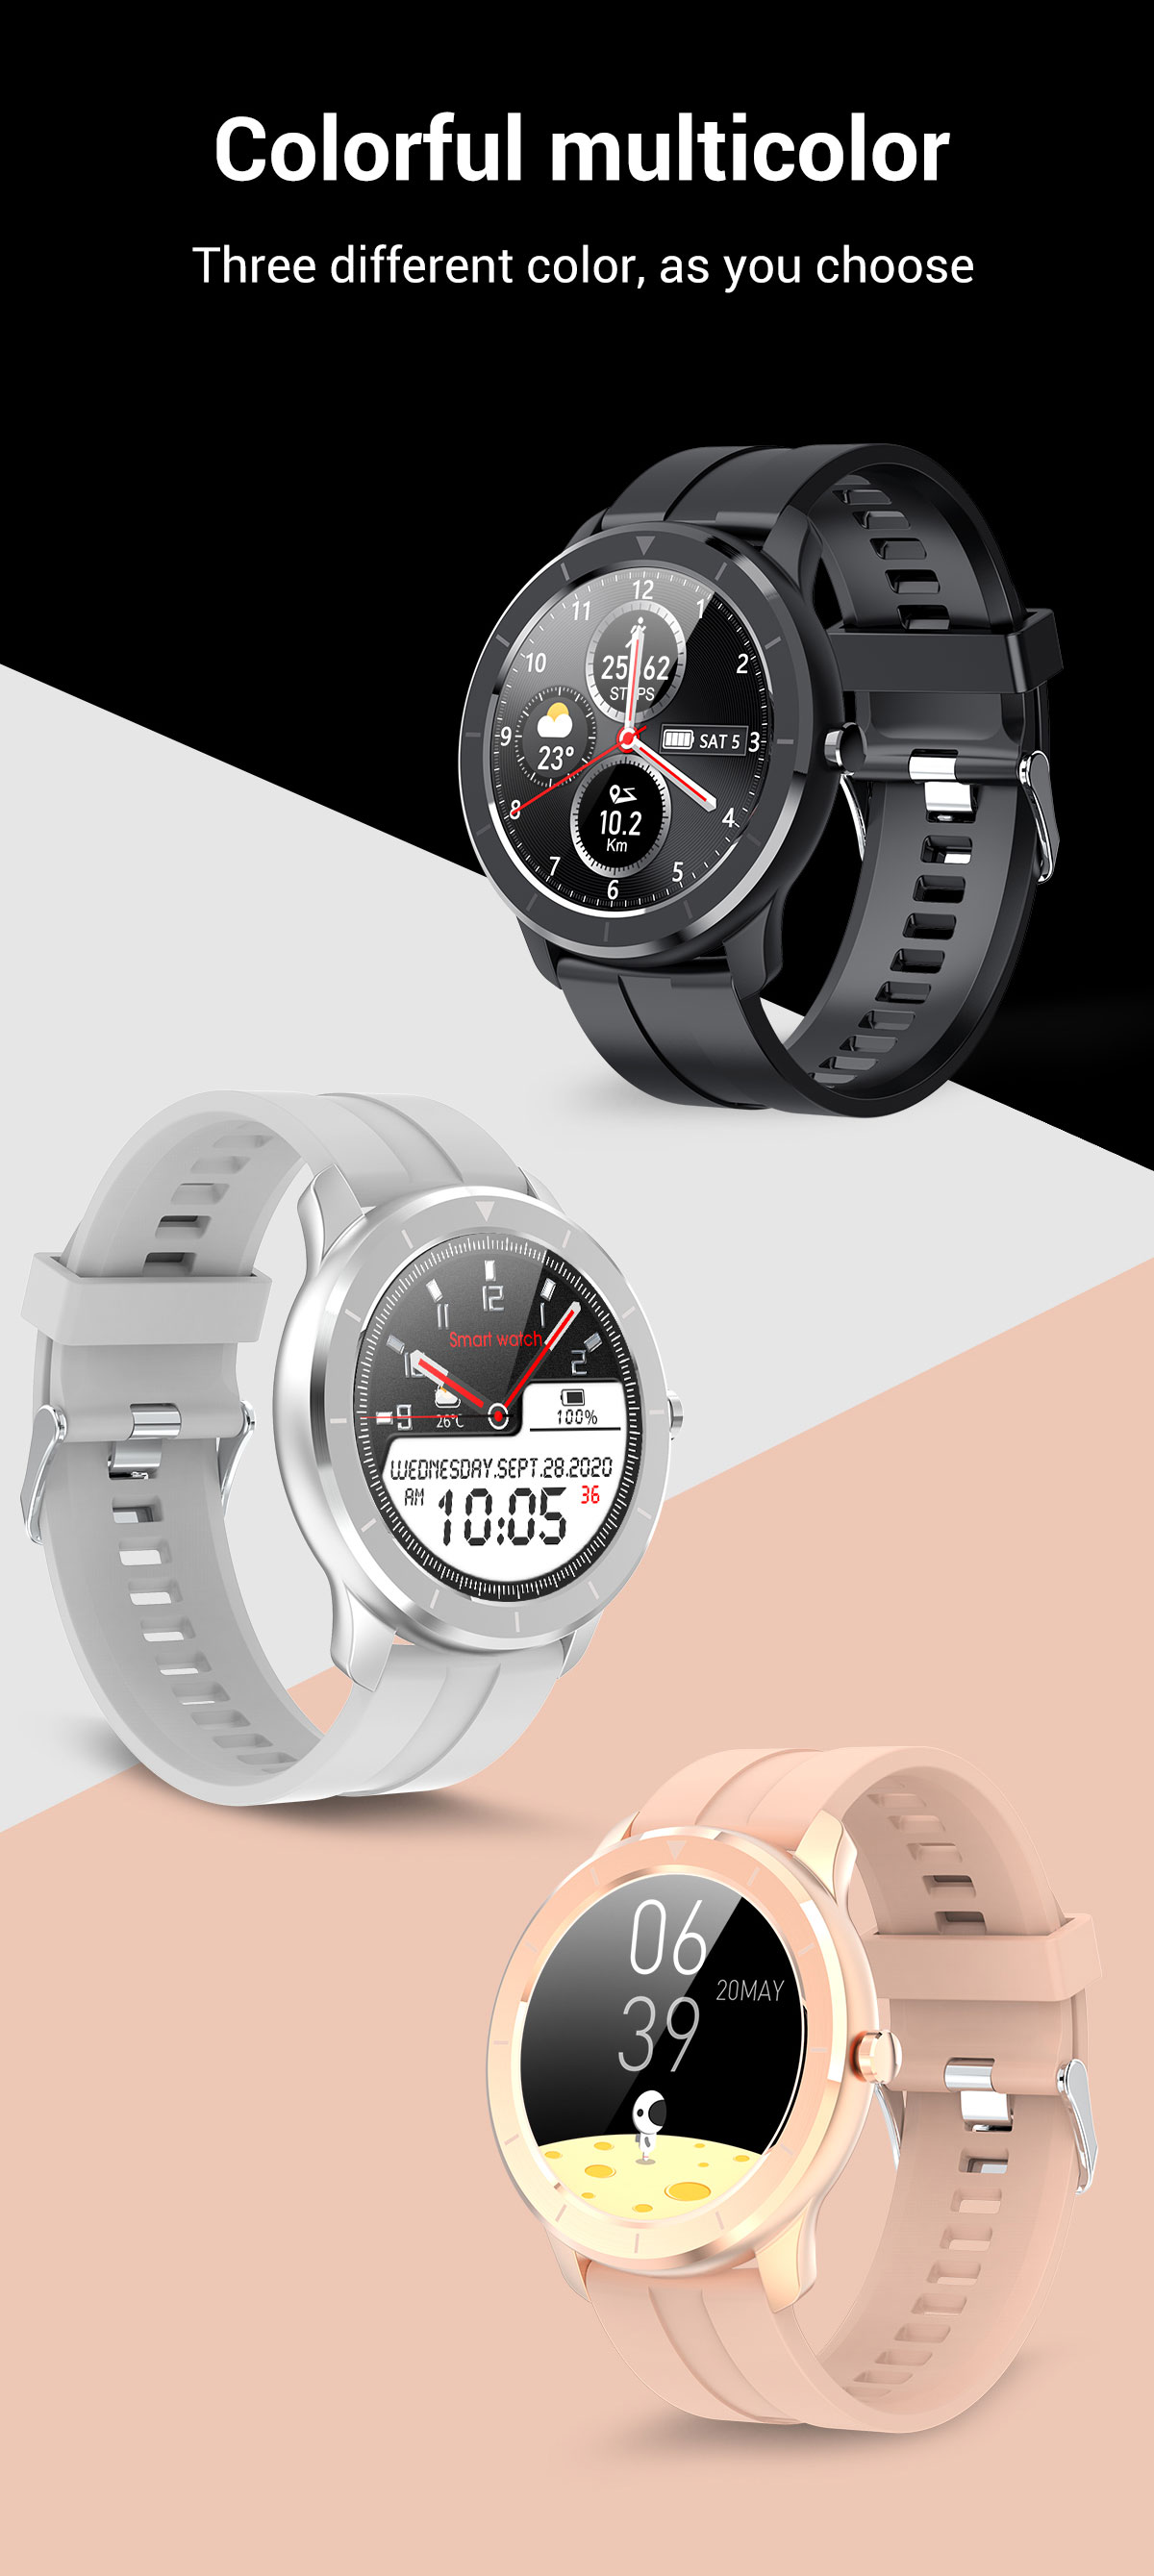 Hb2b87dd4bc134e1a9b53f62eadde3dd31 LEMFO Full Touch Screen Smart Watch Waterproof Smartwatch Men